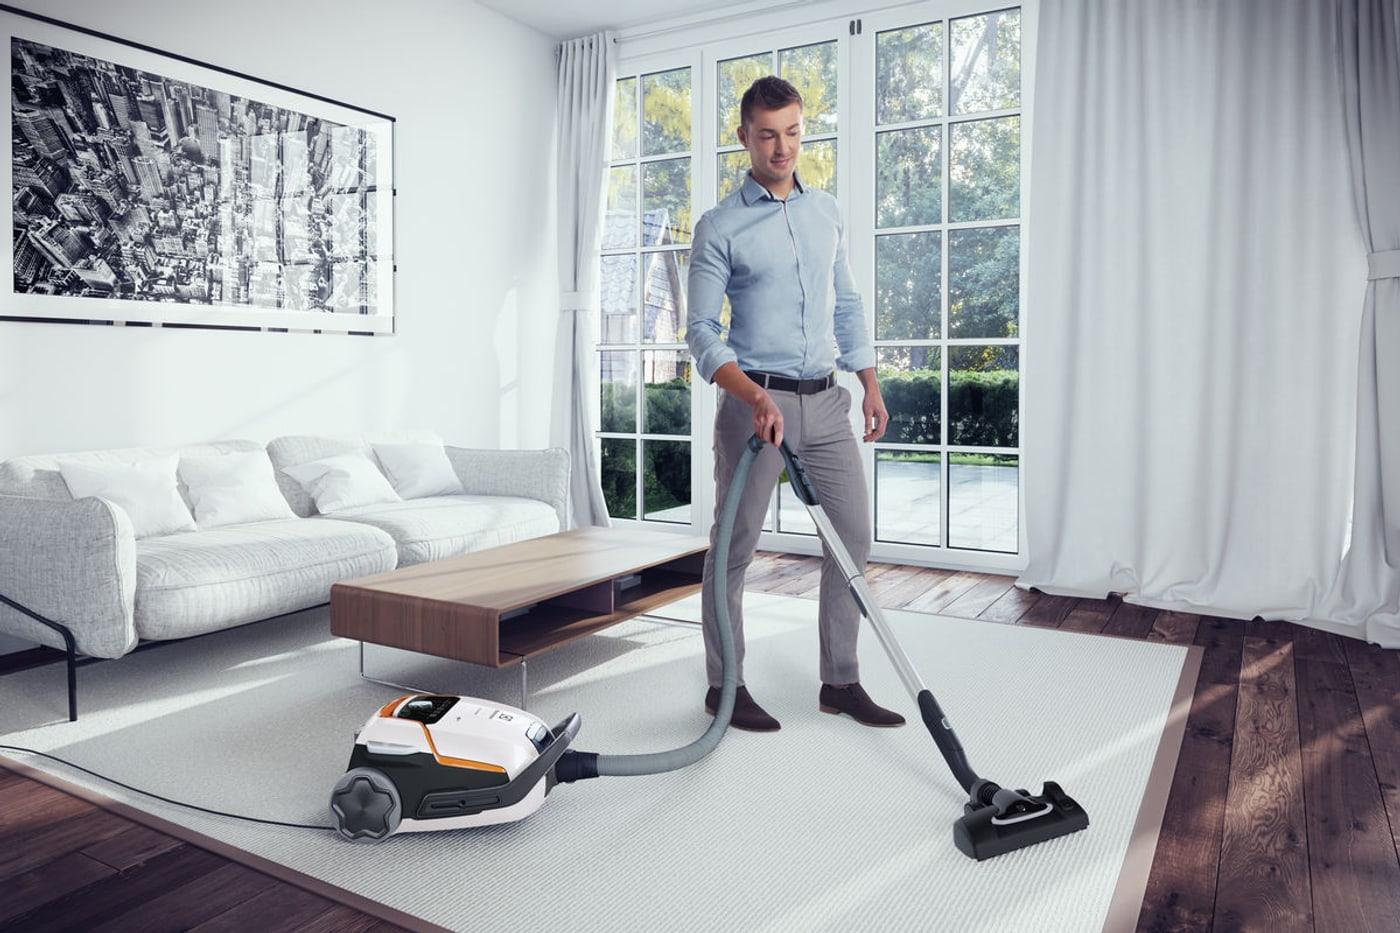 electrolux staubsauger ultraone euo93iw staubsauger migros. Black Bedroom Furniture Sets. Home Design Ideas